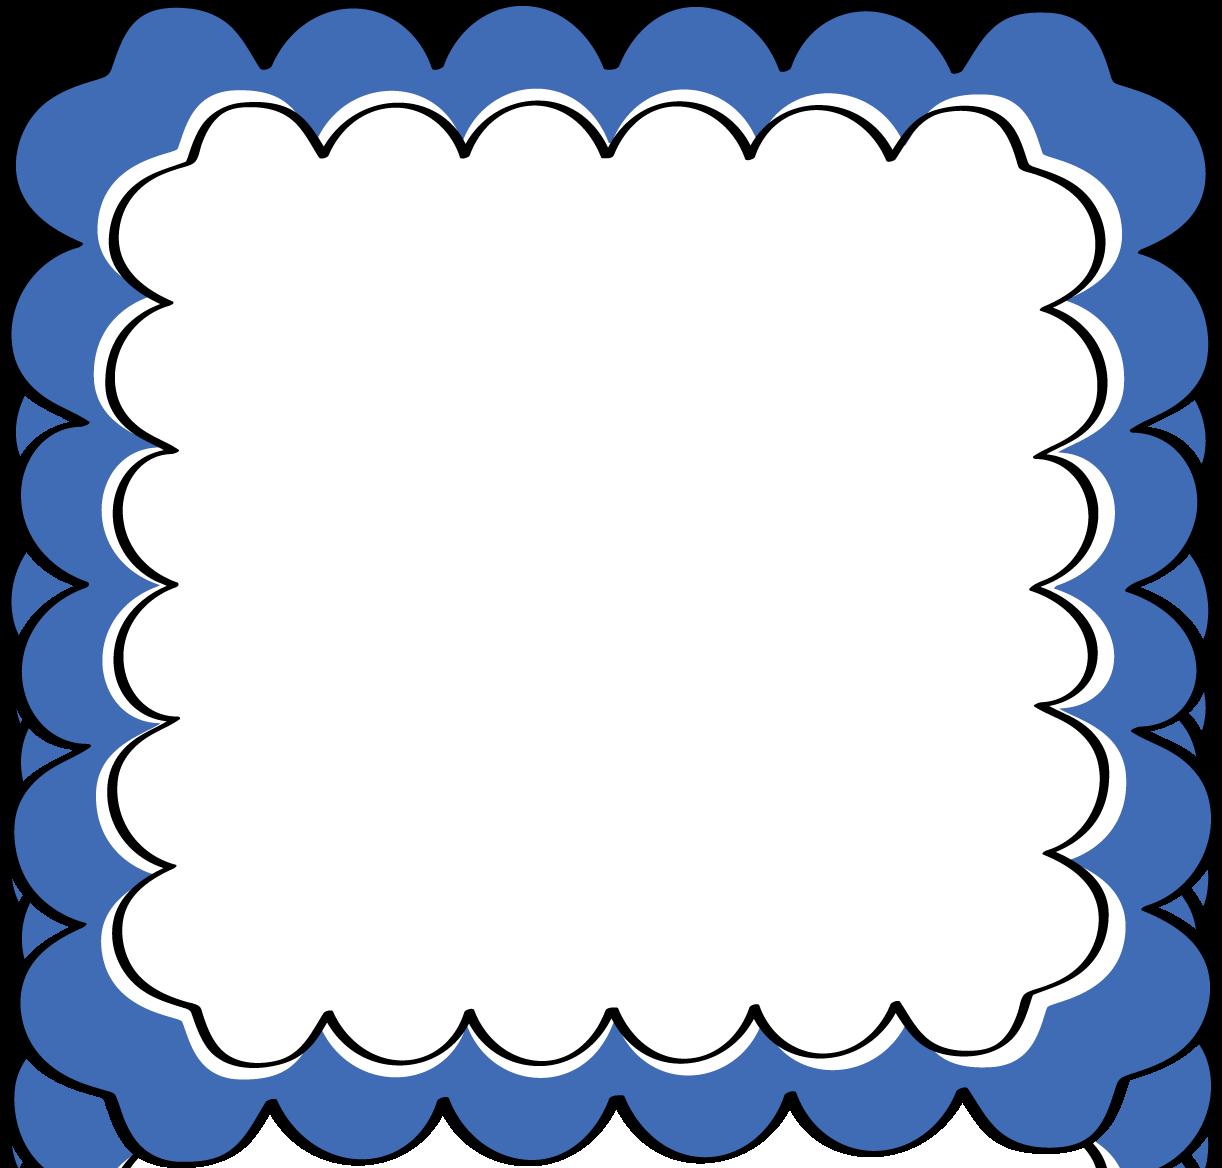 Blur clipart round frame Blue Blue Zone Square Clipart